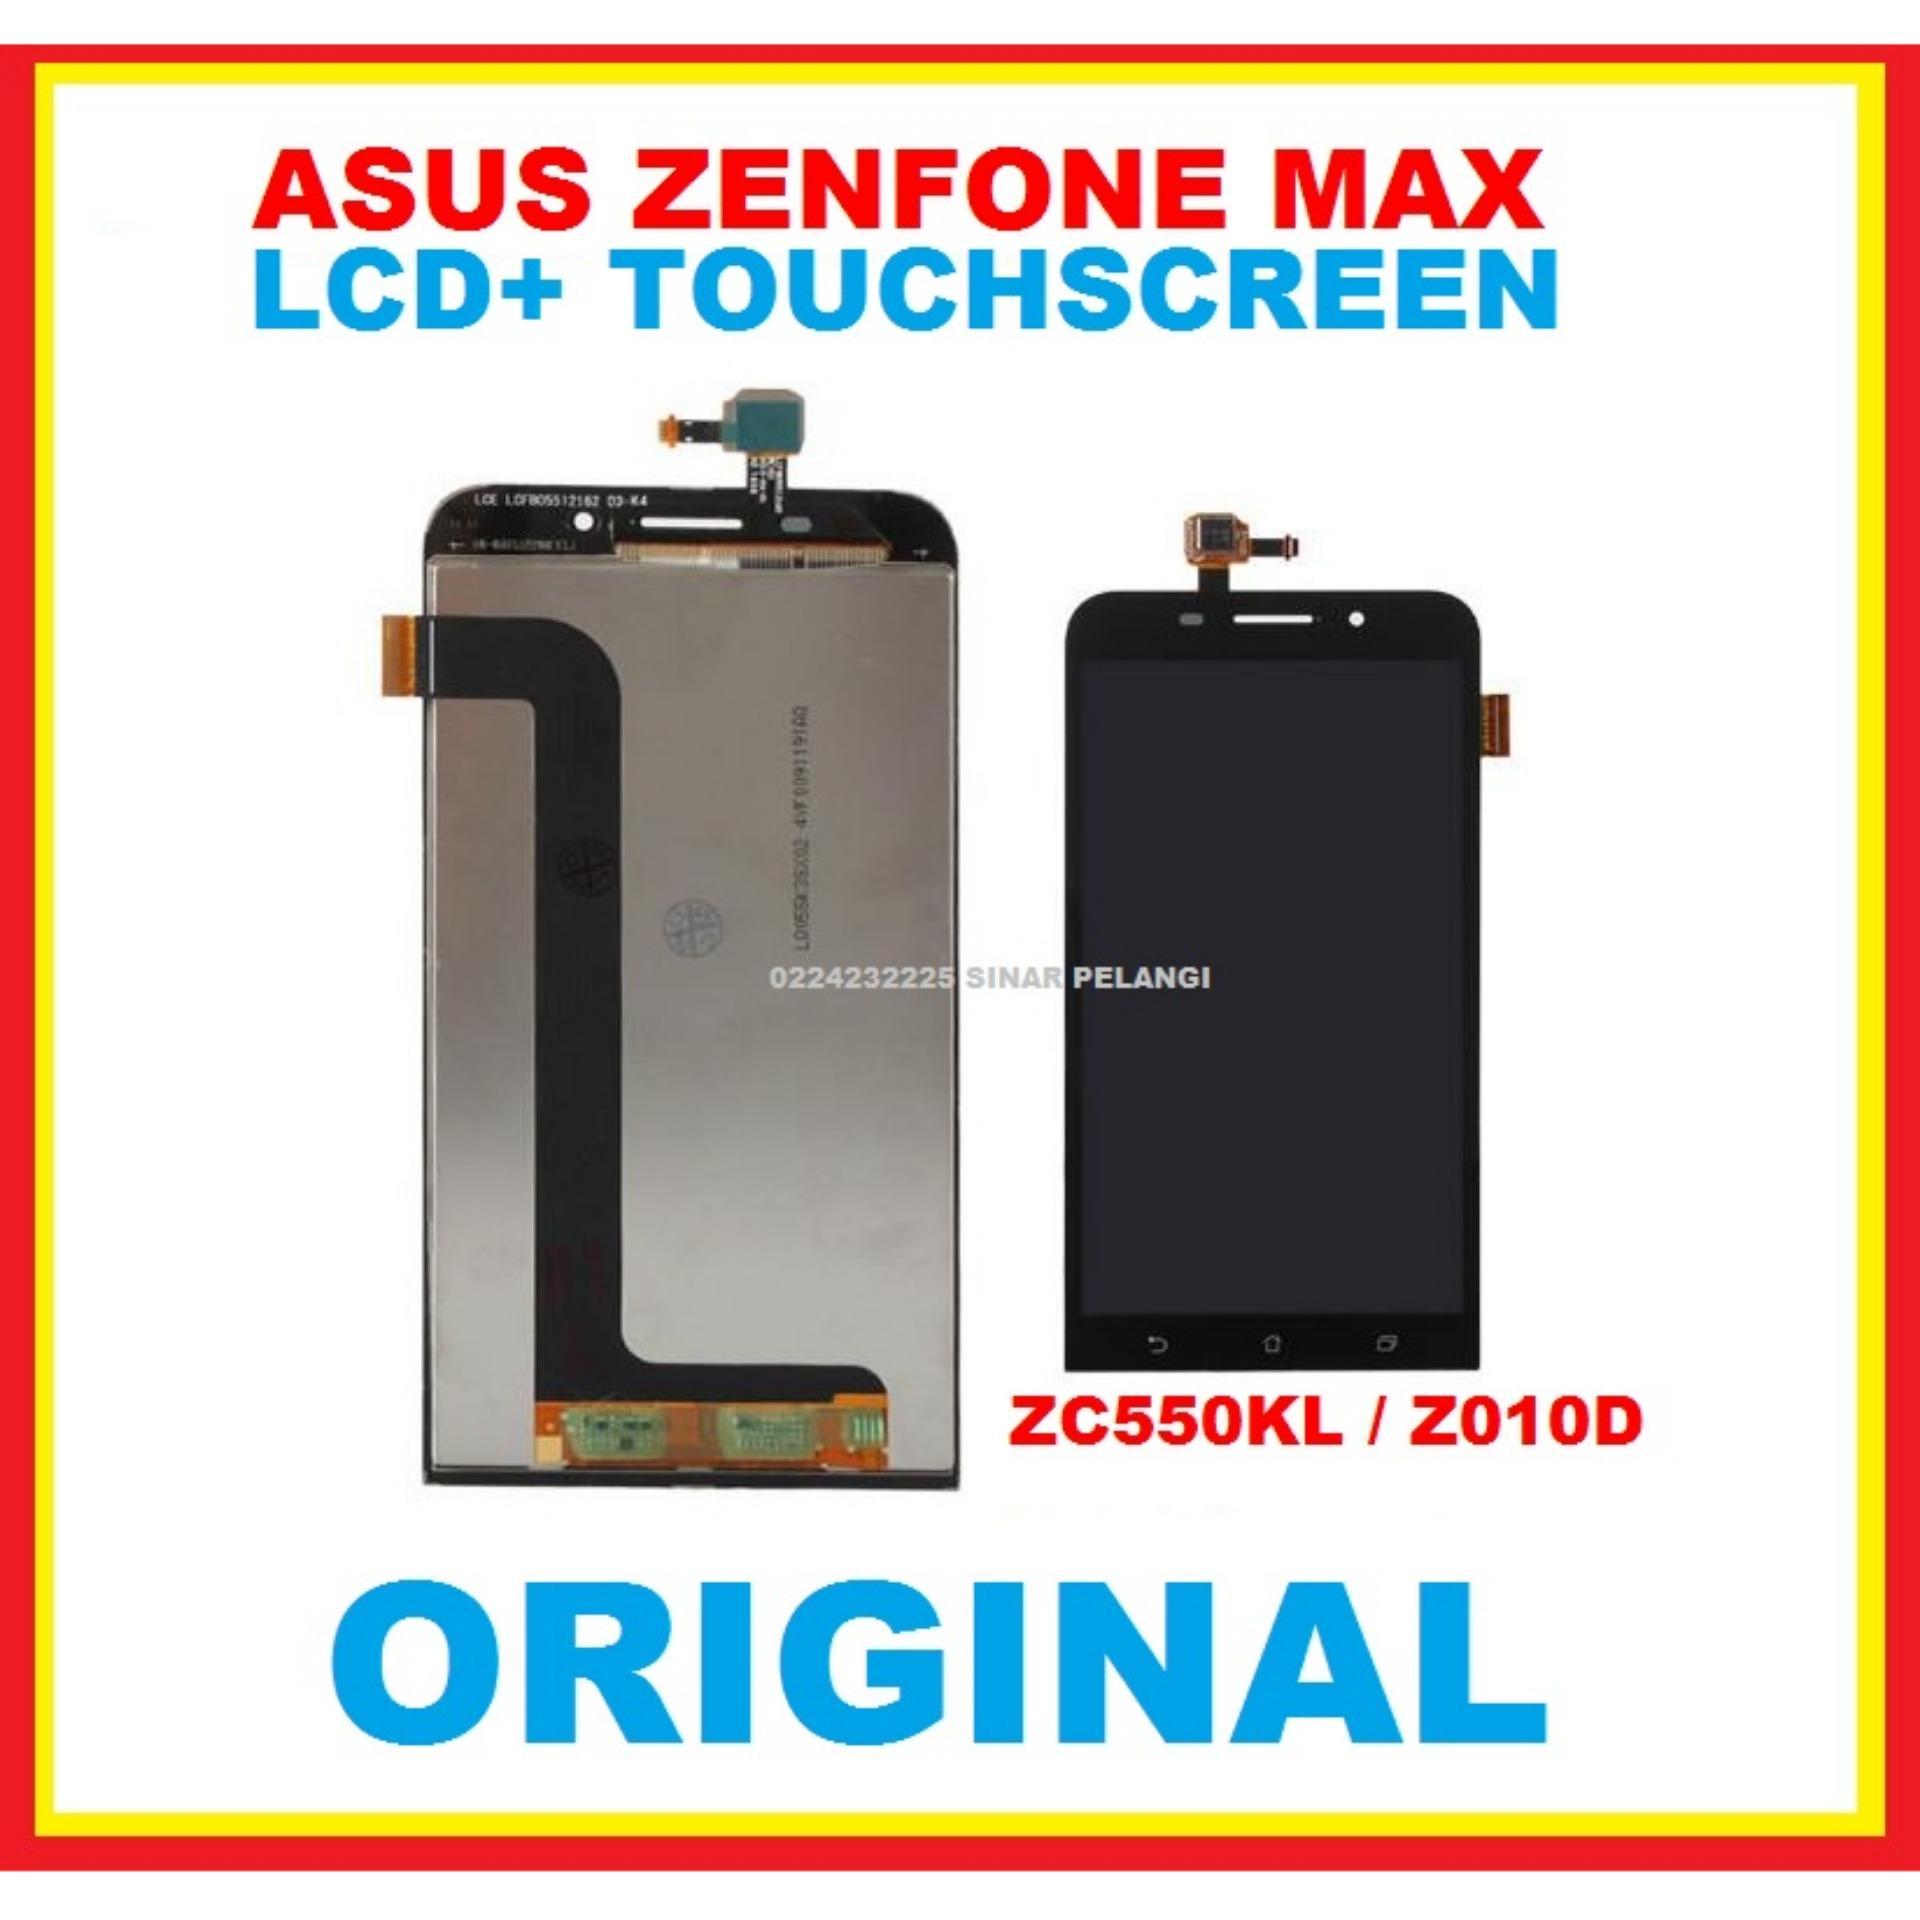 LAYAR LCD TOUCHSCREEN ASUS ZENFONE MAX ZC550KL Z010D  5.5 INCH PENGGANTI LCD TOUCH LAYAR SENTUH BLACK ORIGINAL 906771